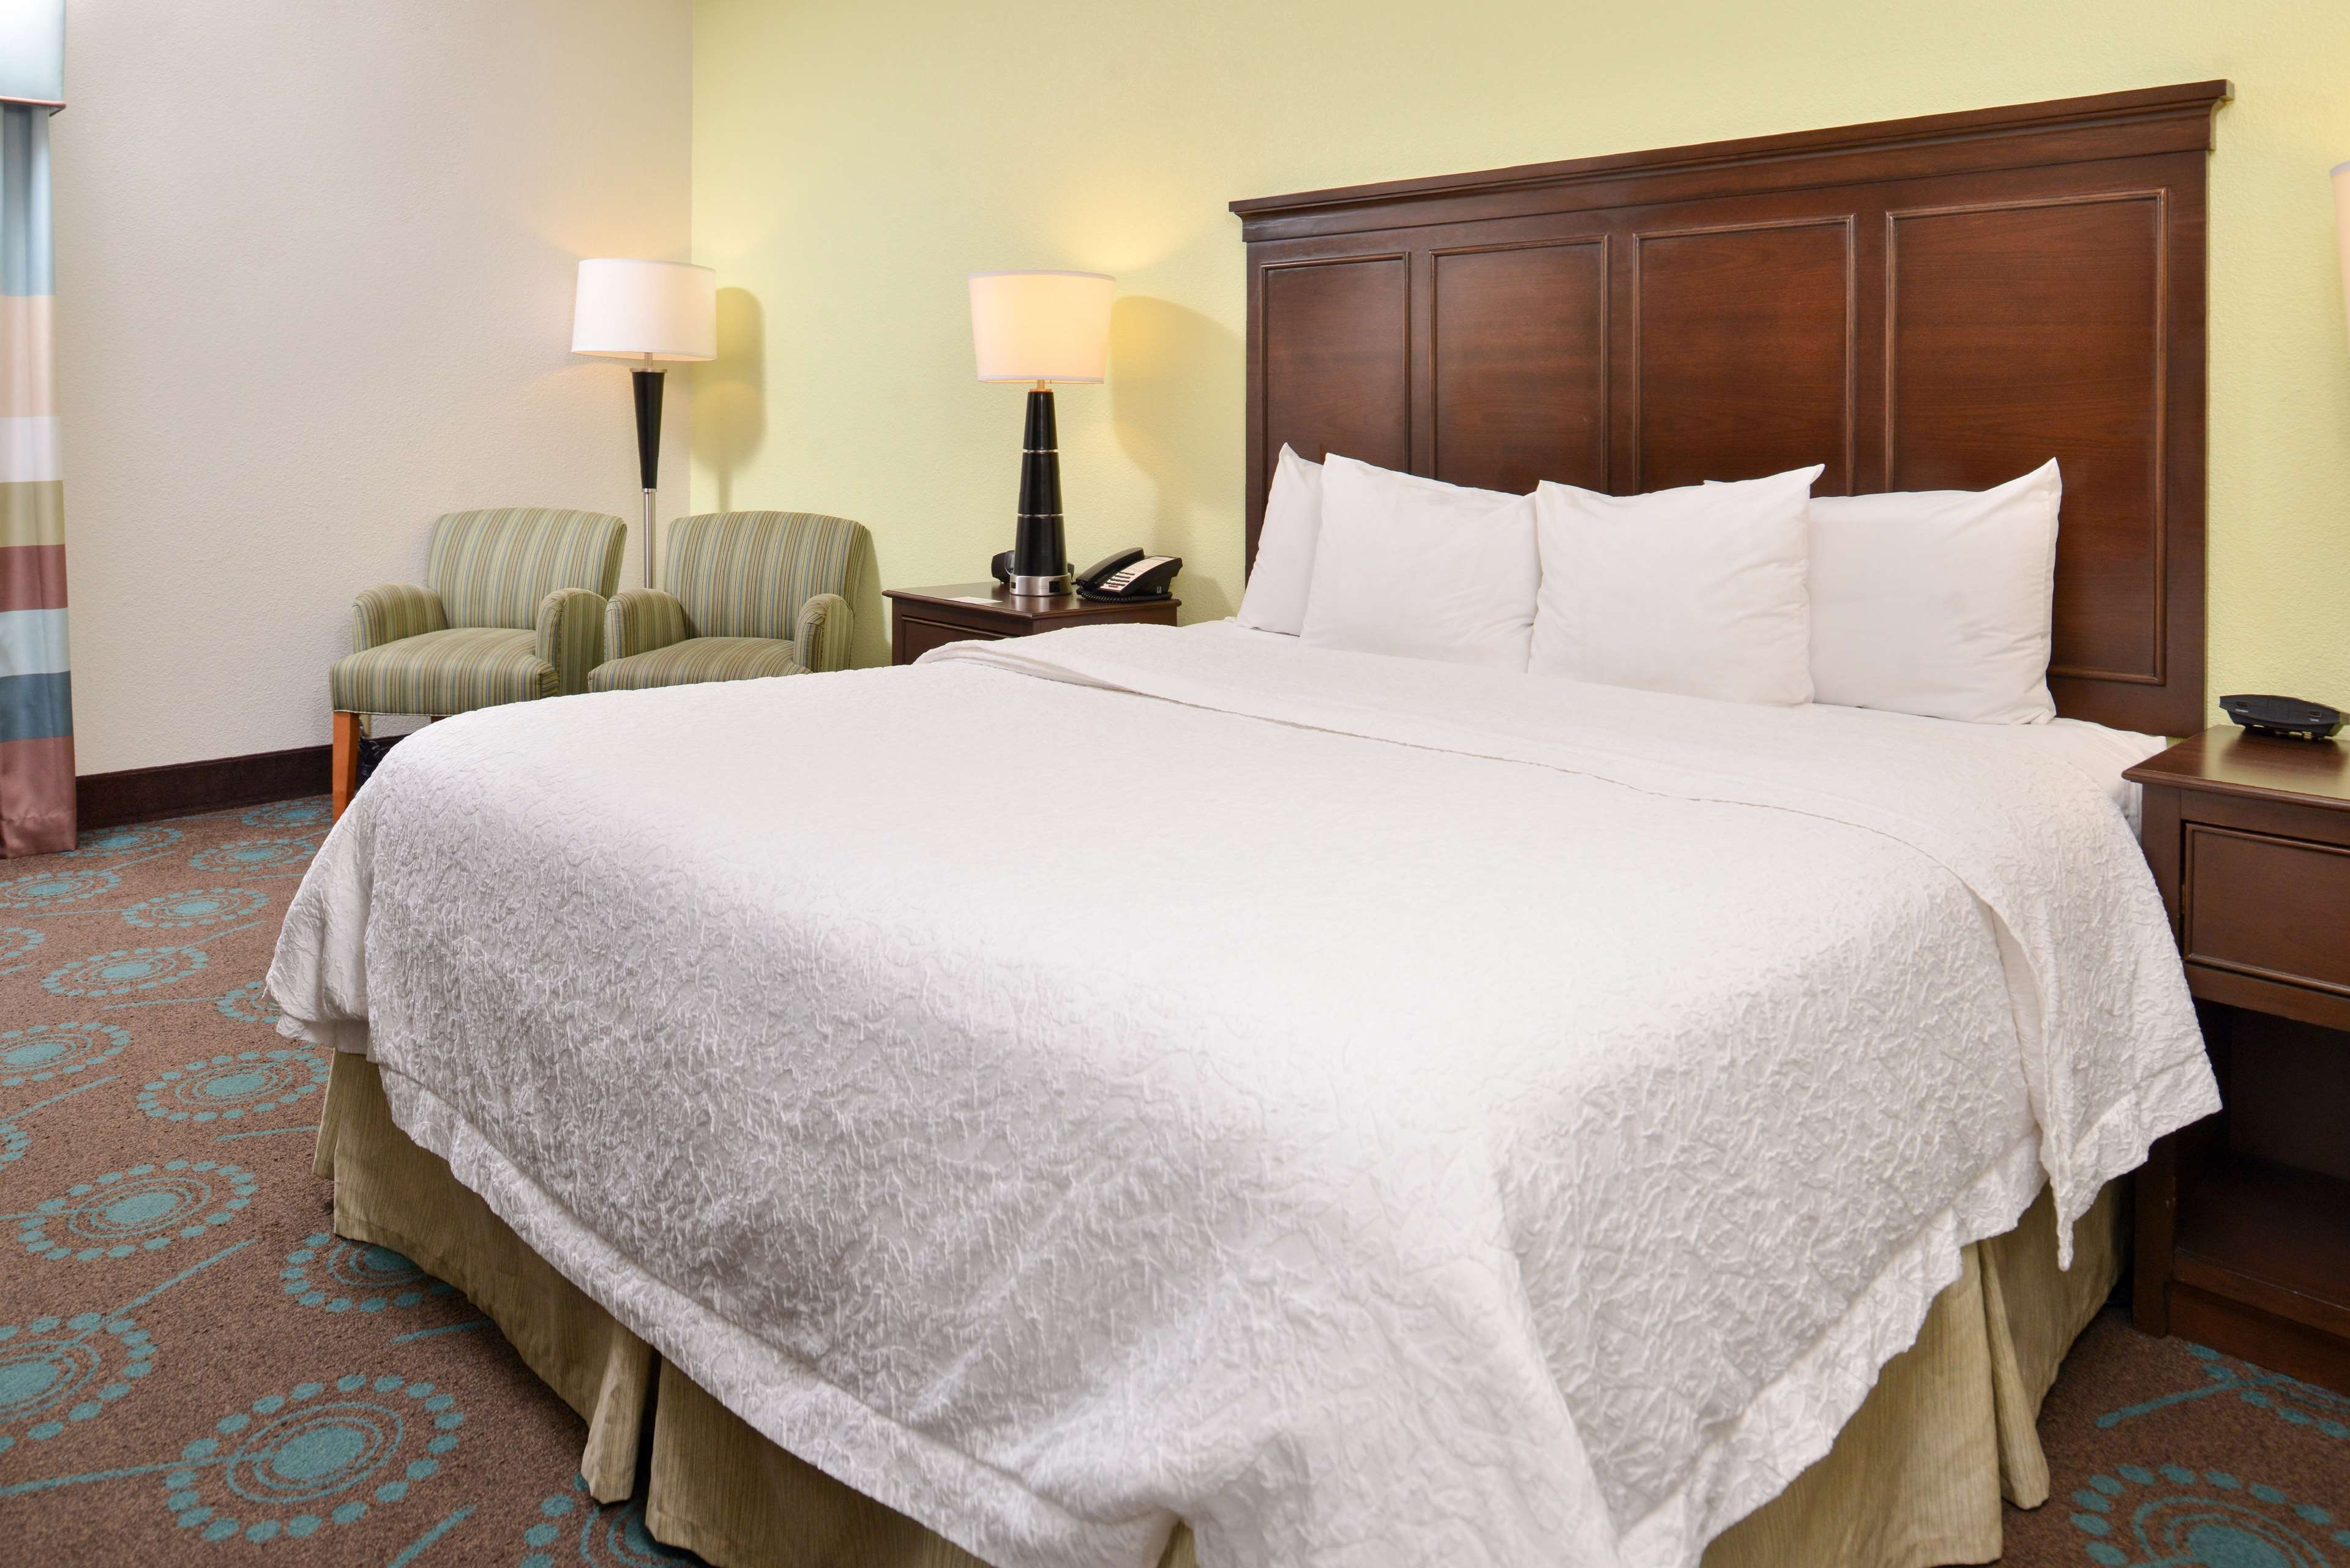 Hampton Inn & Suites Newport News (Oyster Point) image 35